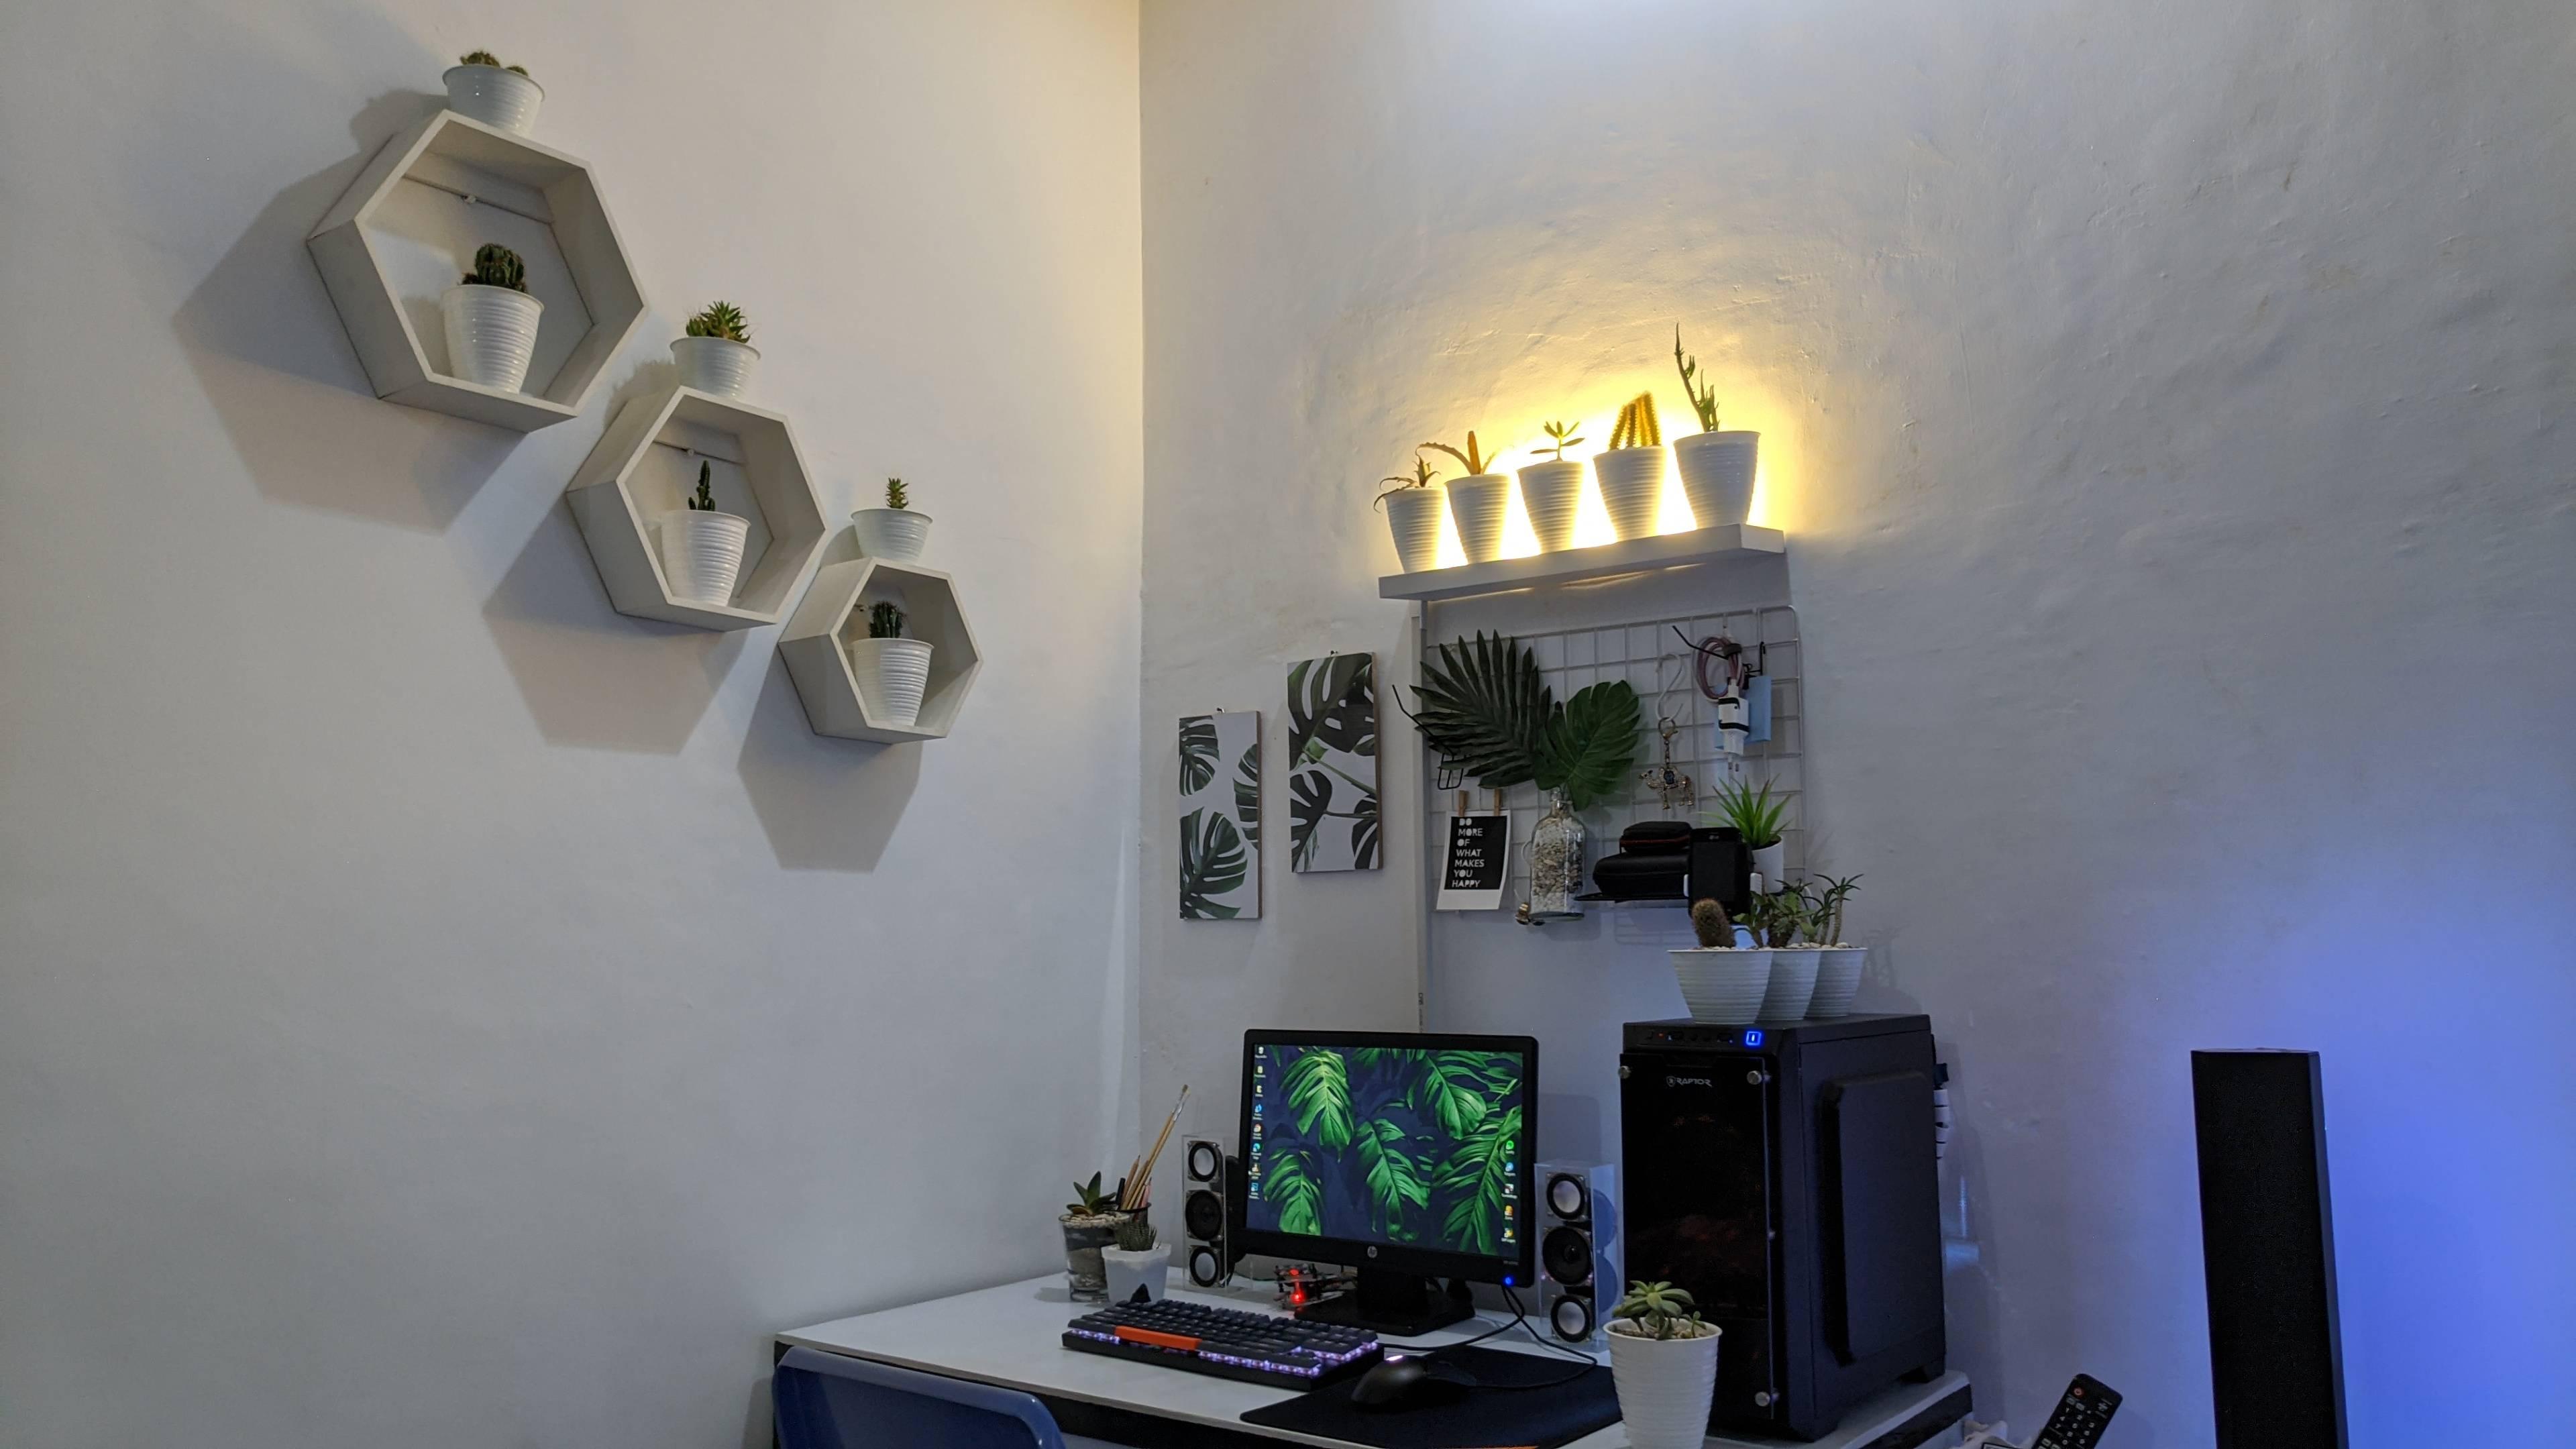 norfayoga's Setup - Minimalist plant setup | Scooget